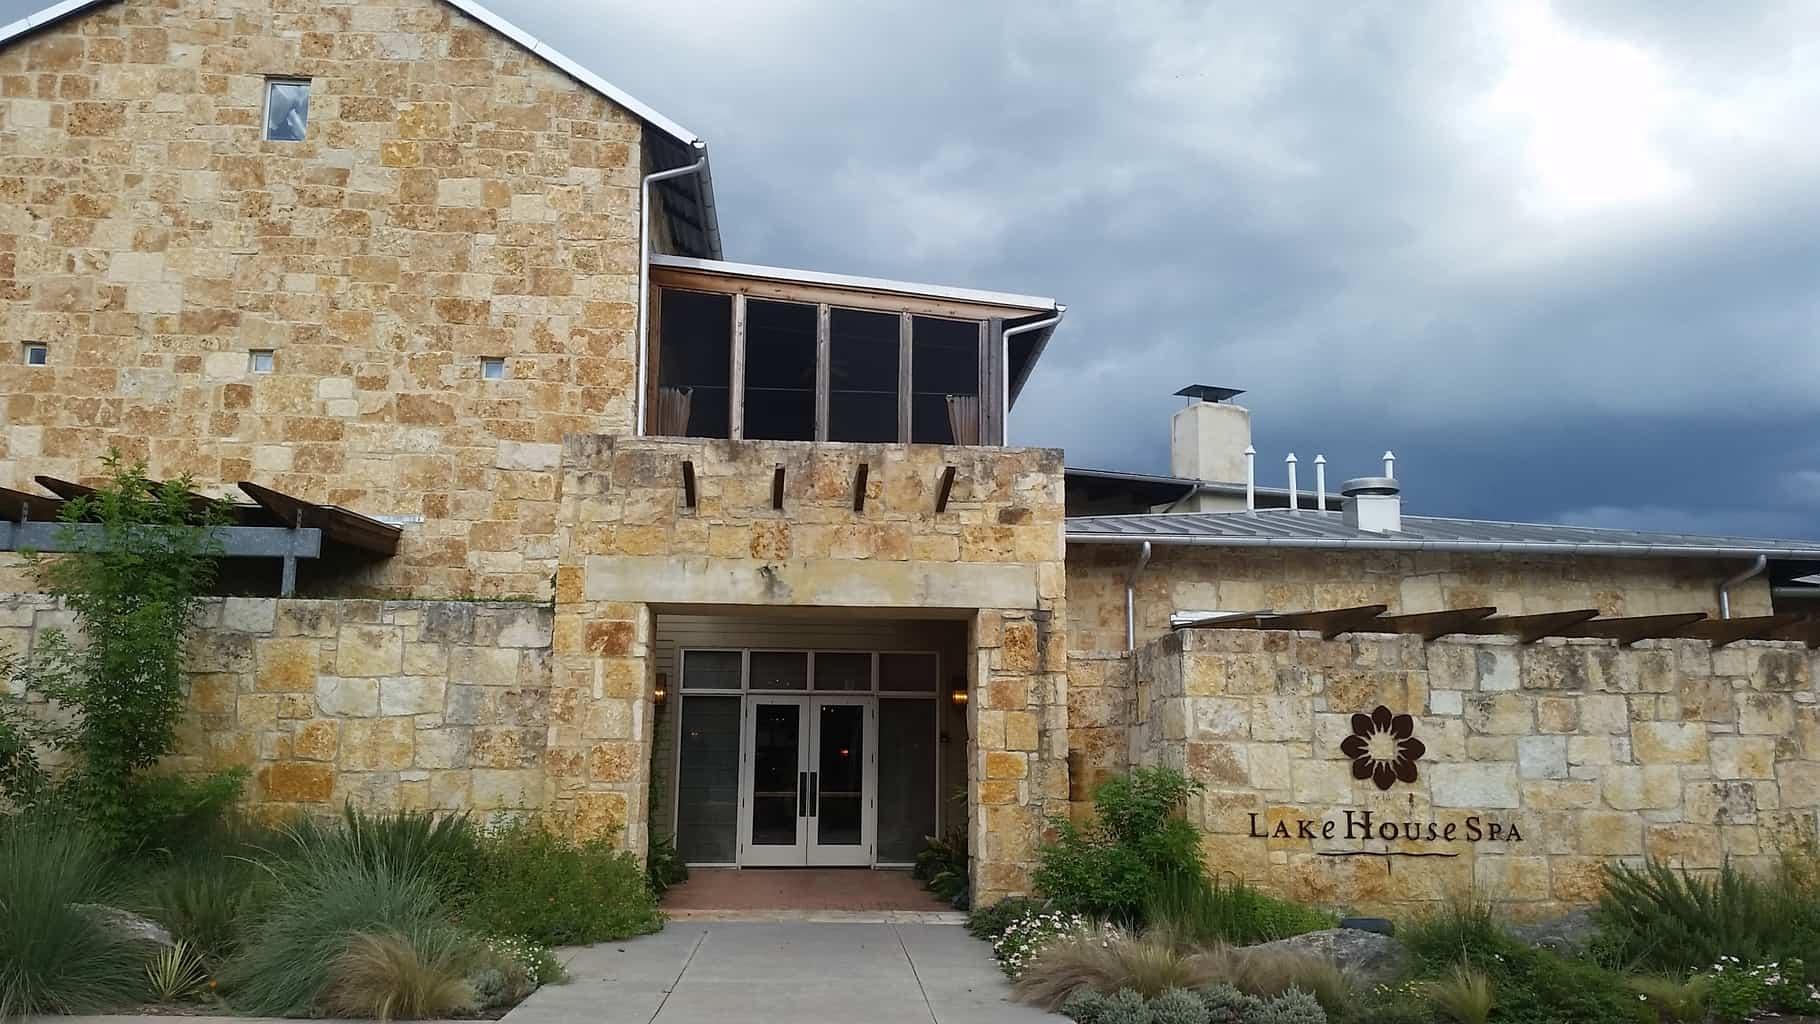 Lake Austin Spa, Austin Texas, Day Trip | Travel Review PasstheSushi.com